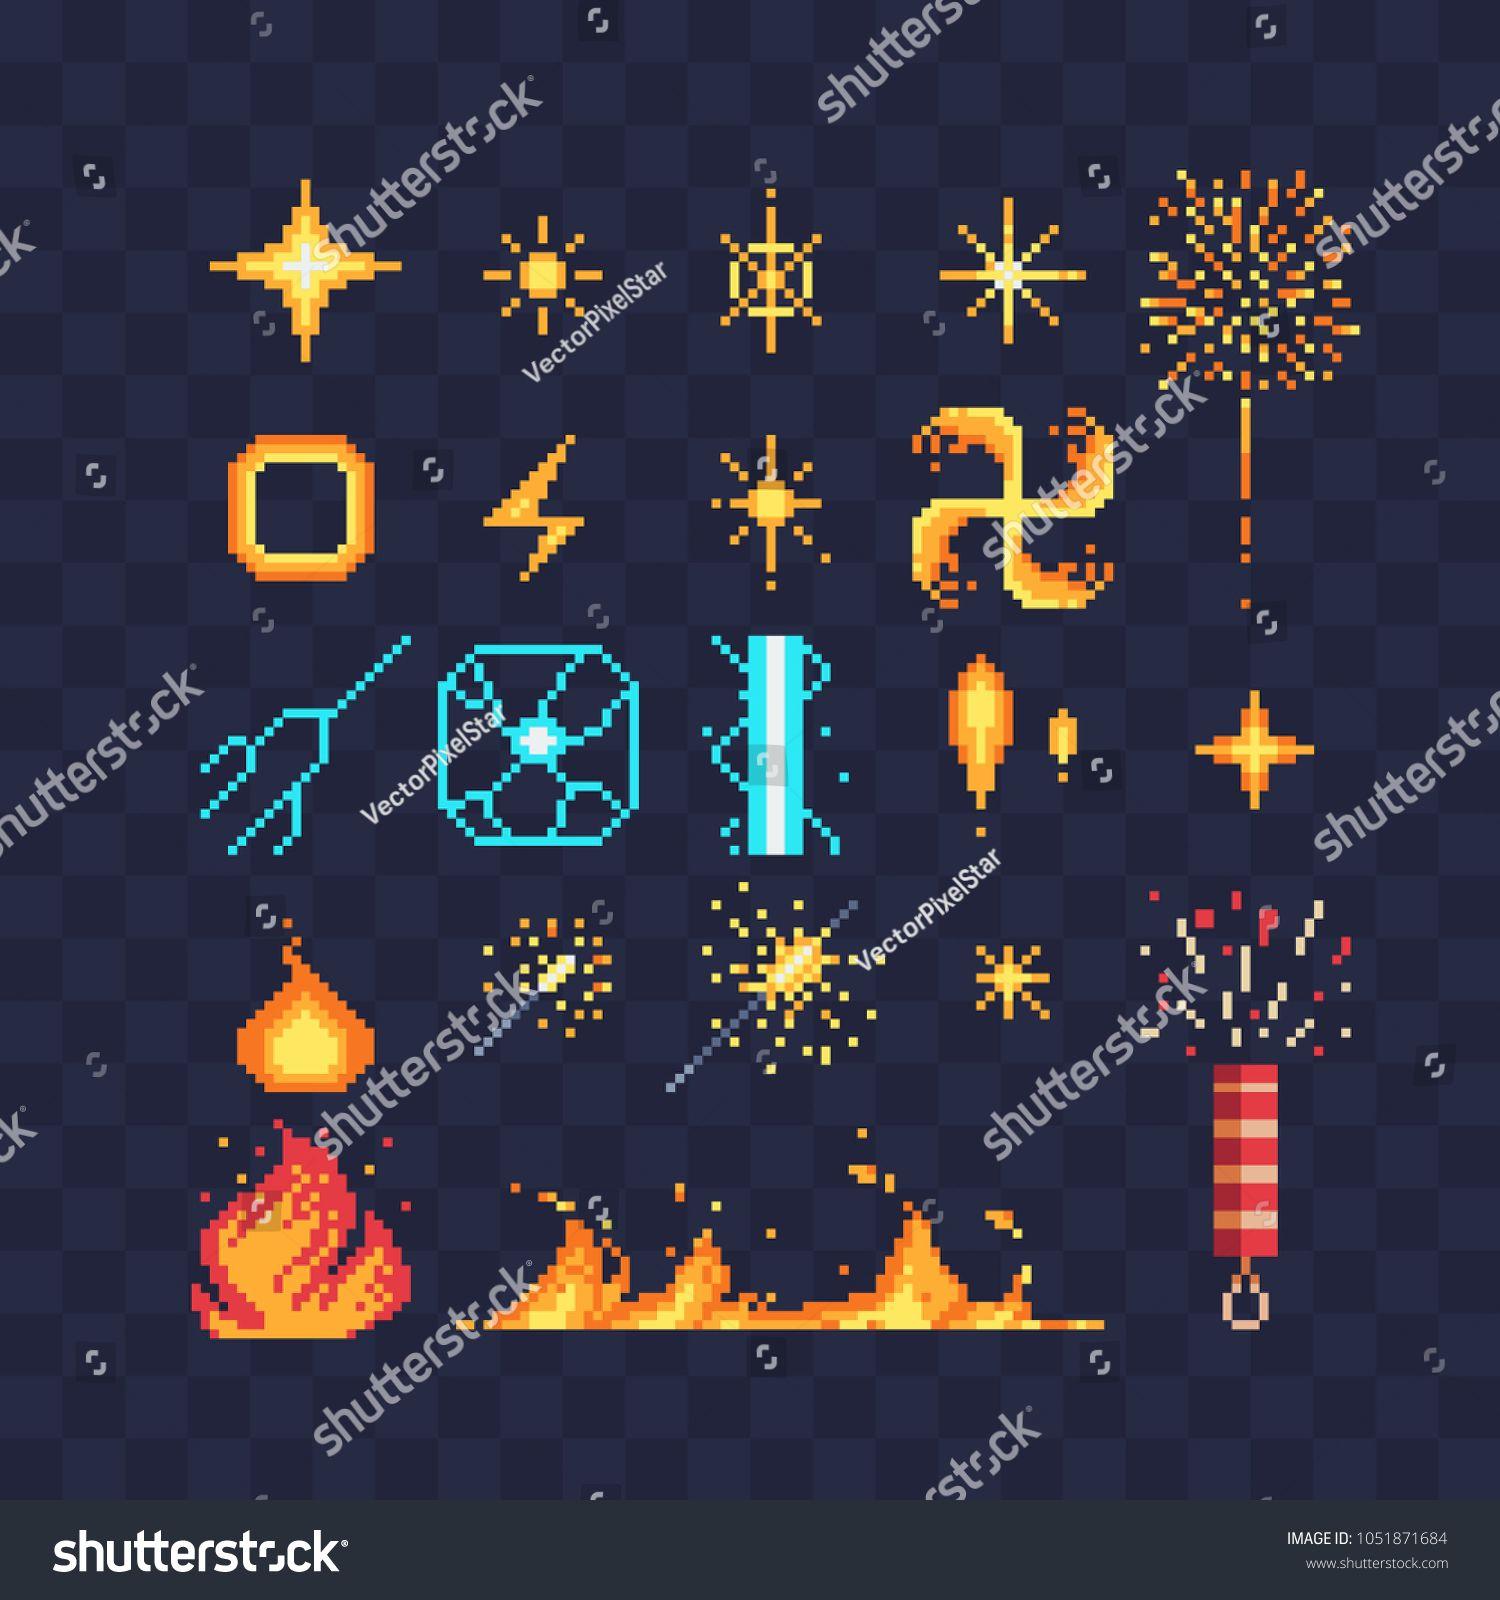 jpg freeuse stock Fx light effects energy symbols pixel art icons